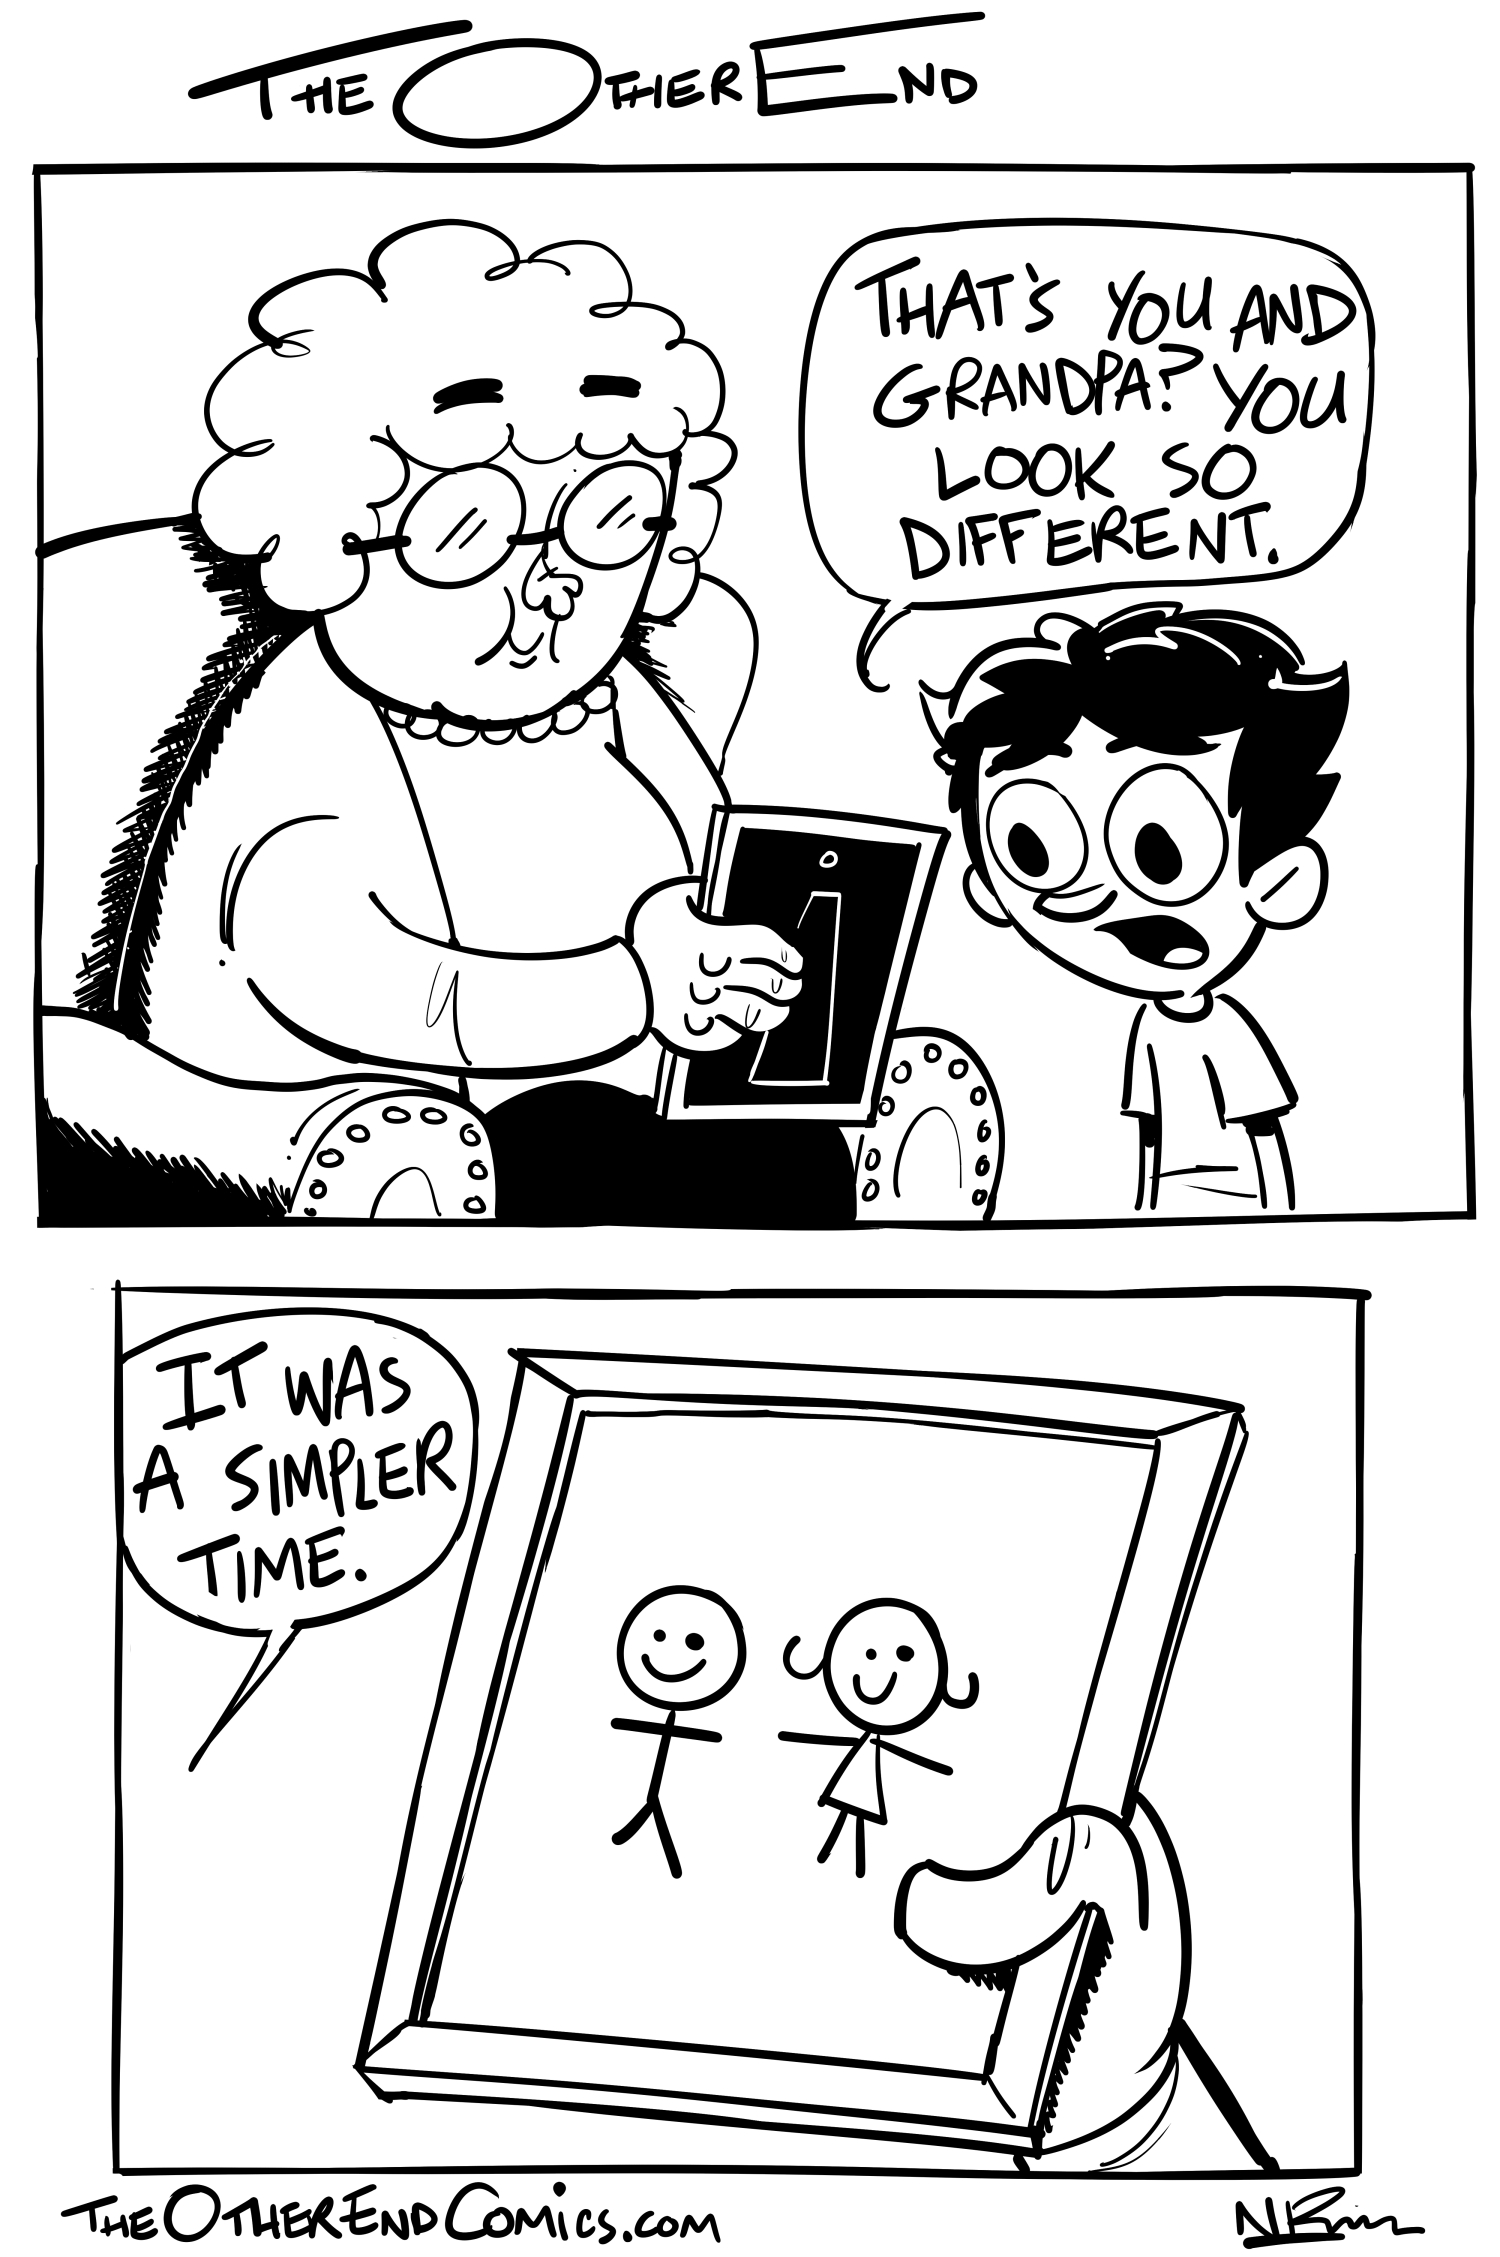 That's a beautiful portrait